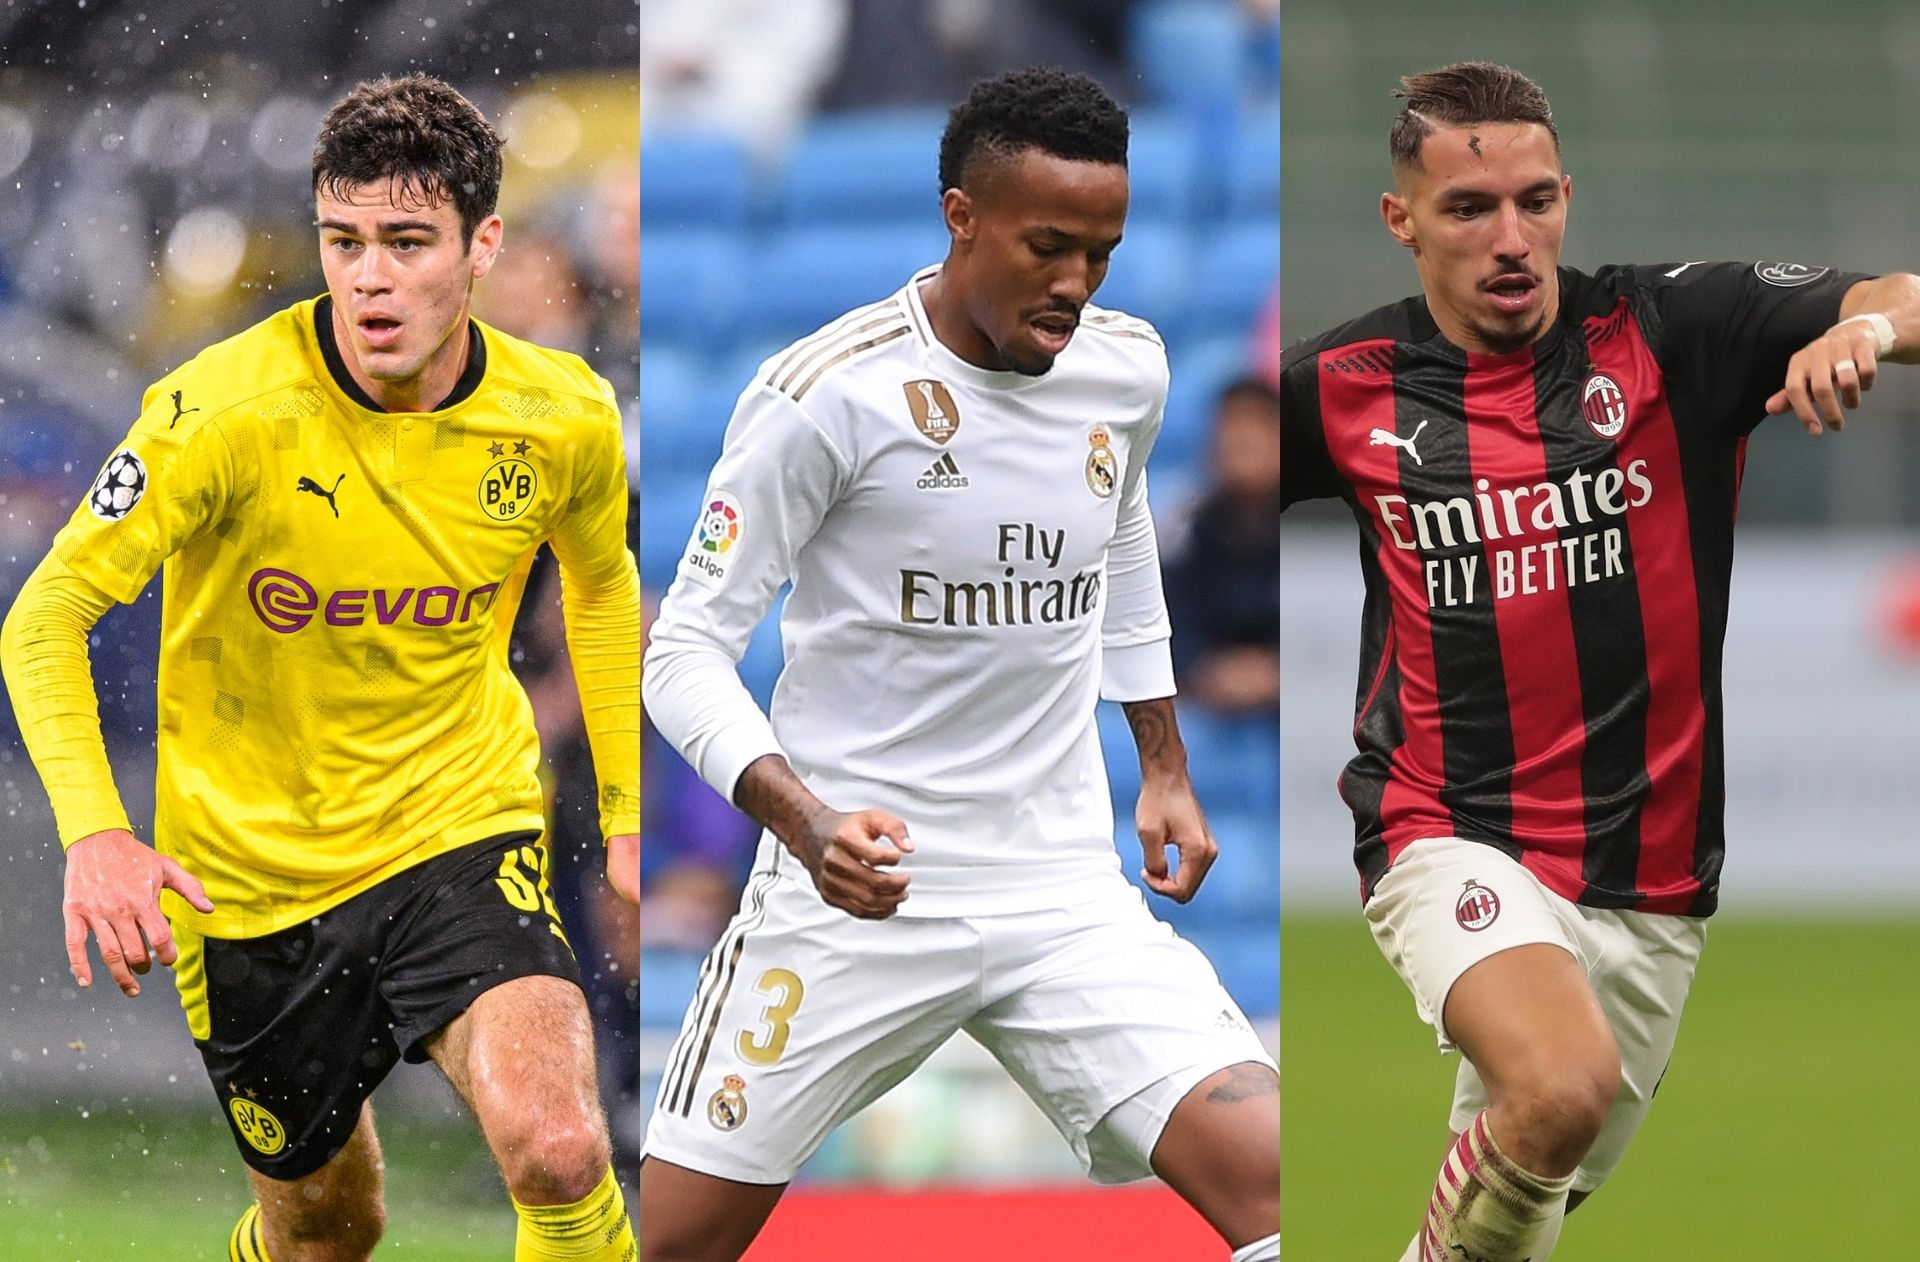 Giovanni Reyna of Borussia Dortmund, Eder Militao of Real Madrid, Ismael Bennacer of AC Milan